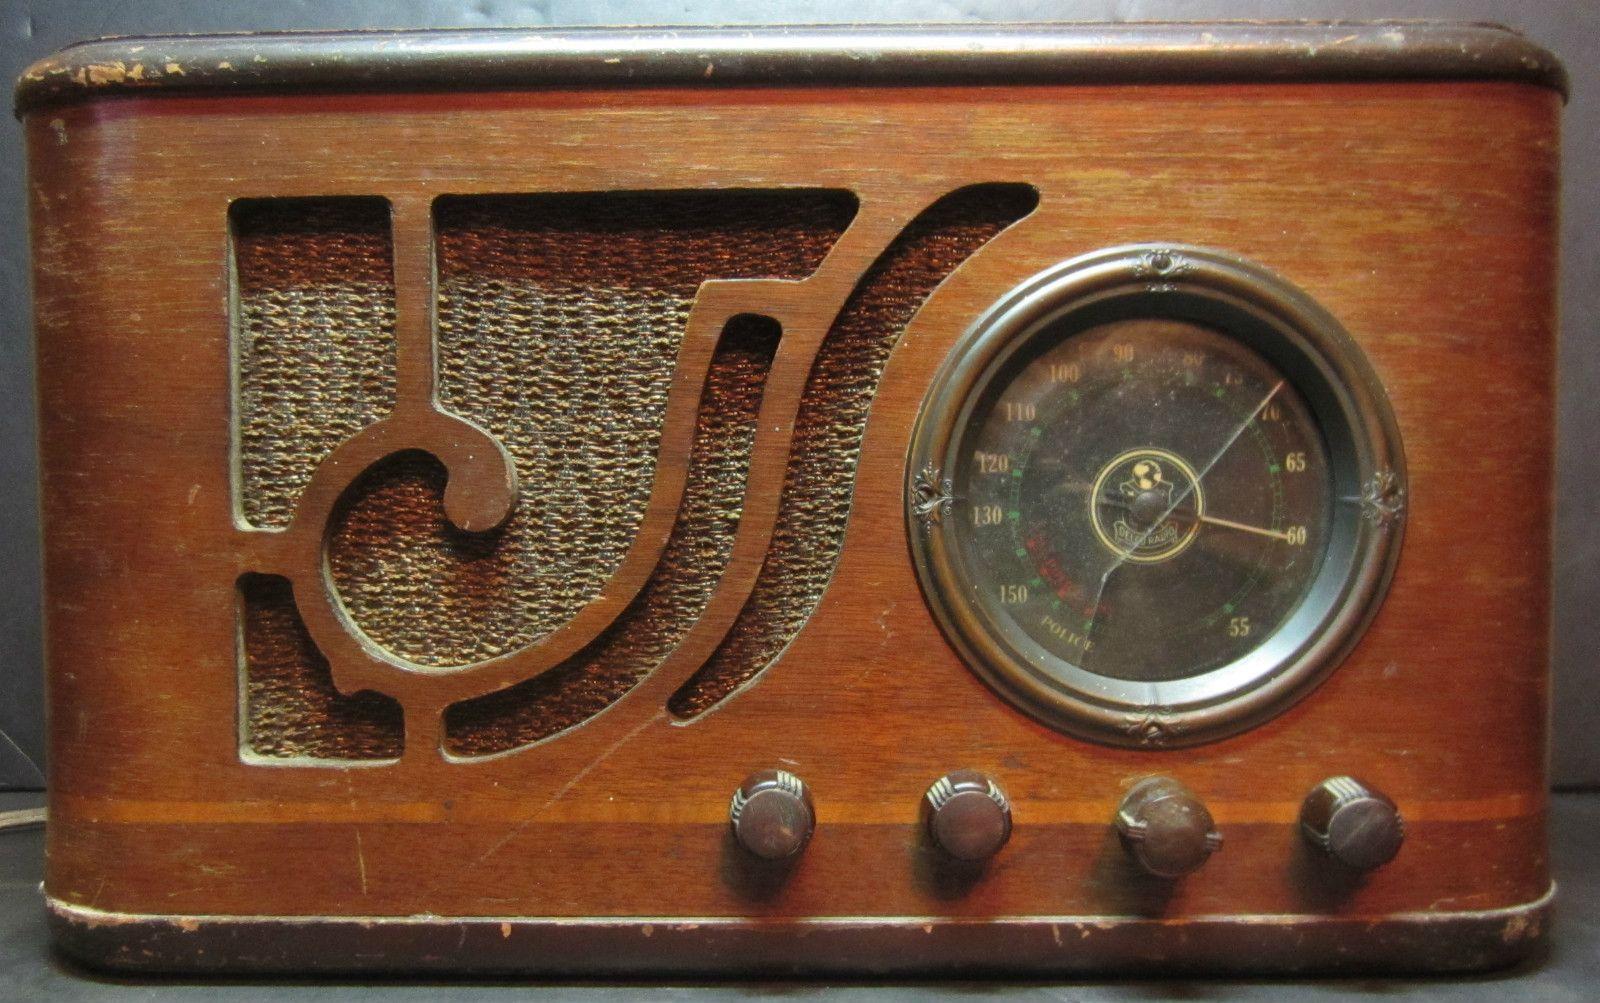 1949 Philco 49 906 Am Fm Radio Not Working For Restoration Or Parts Ebay Vintage Radio Antique Radio Radio